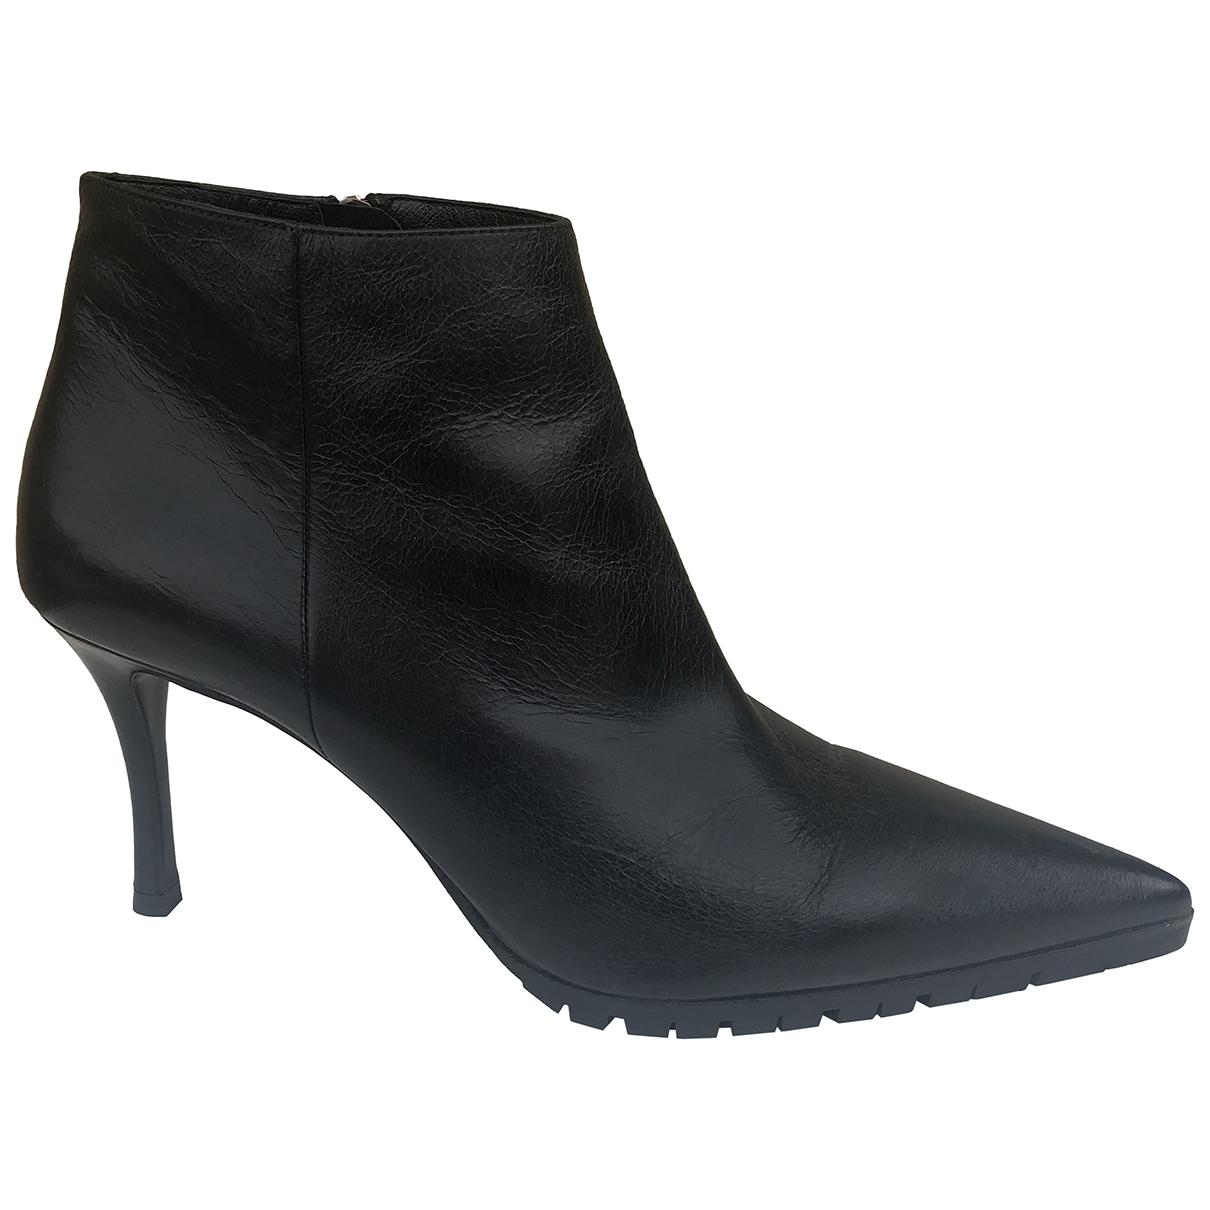 Miu Miu \N Black Leather Ankle boots for Women 41 EU